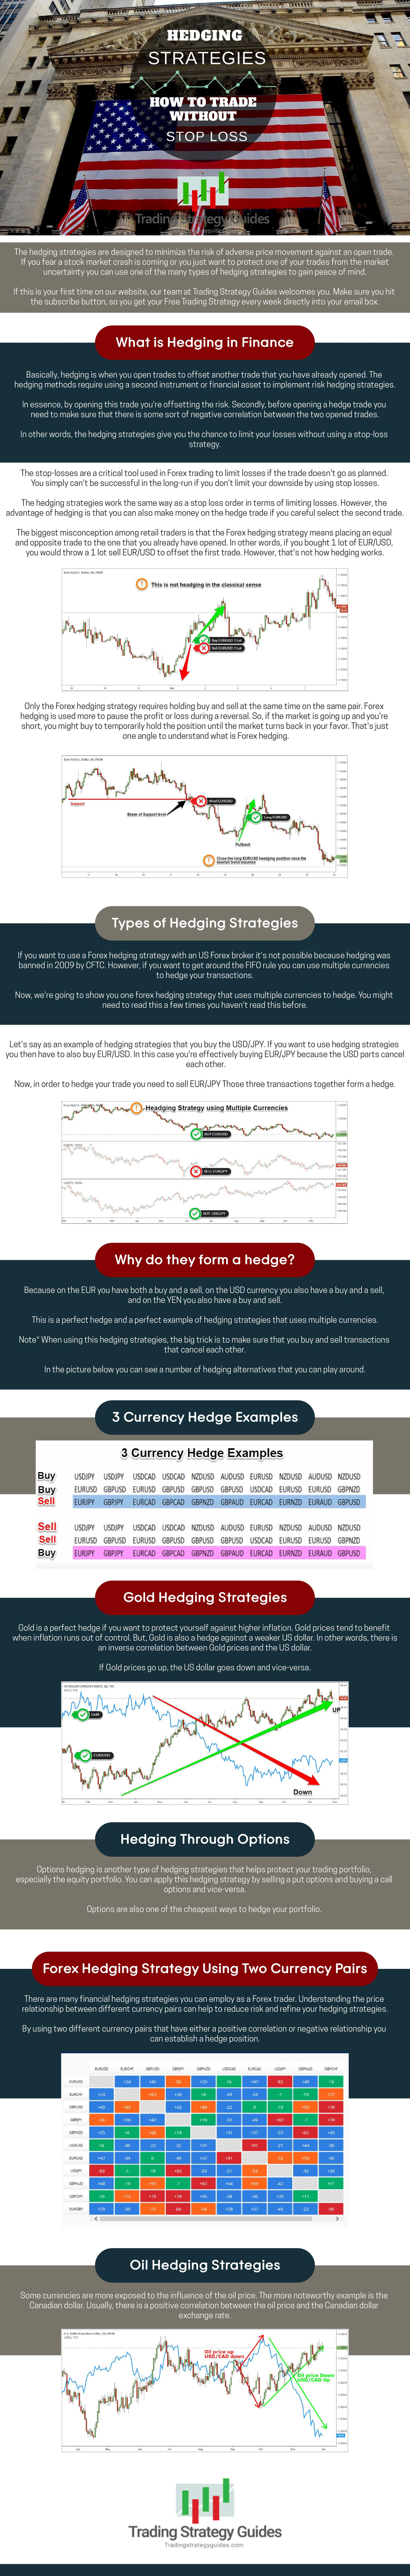 stock hedging strategies infographic